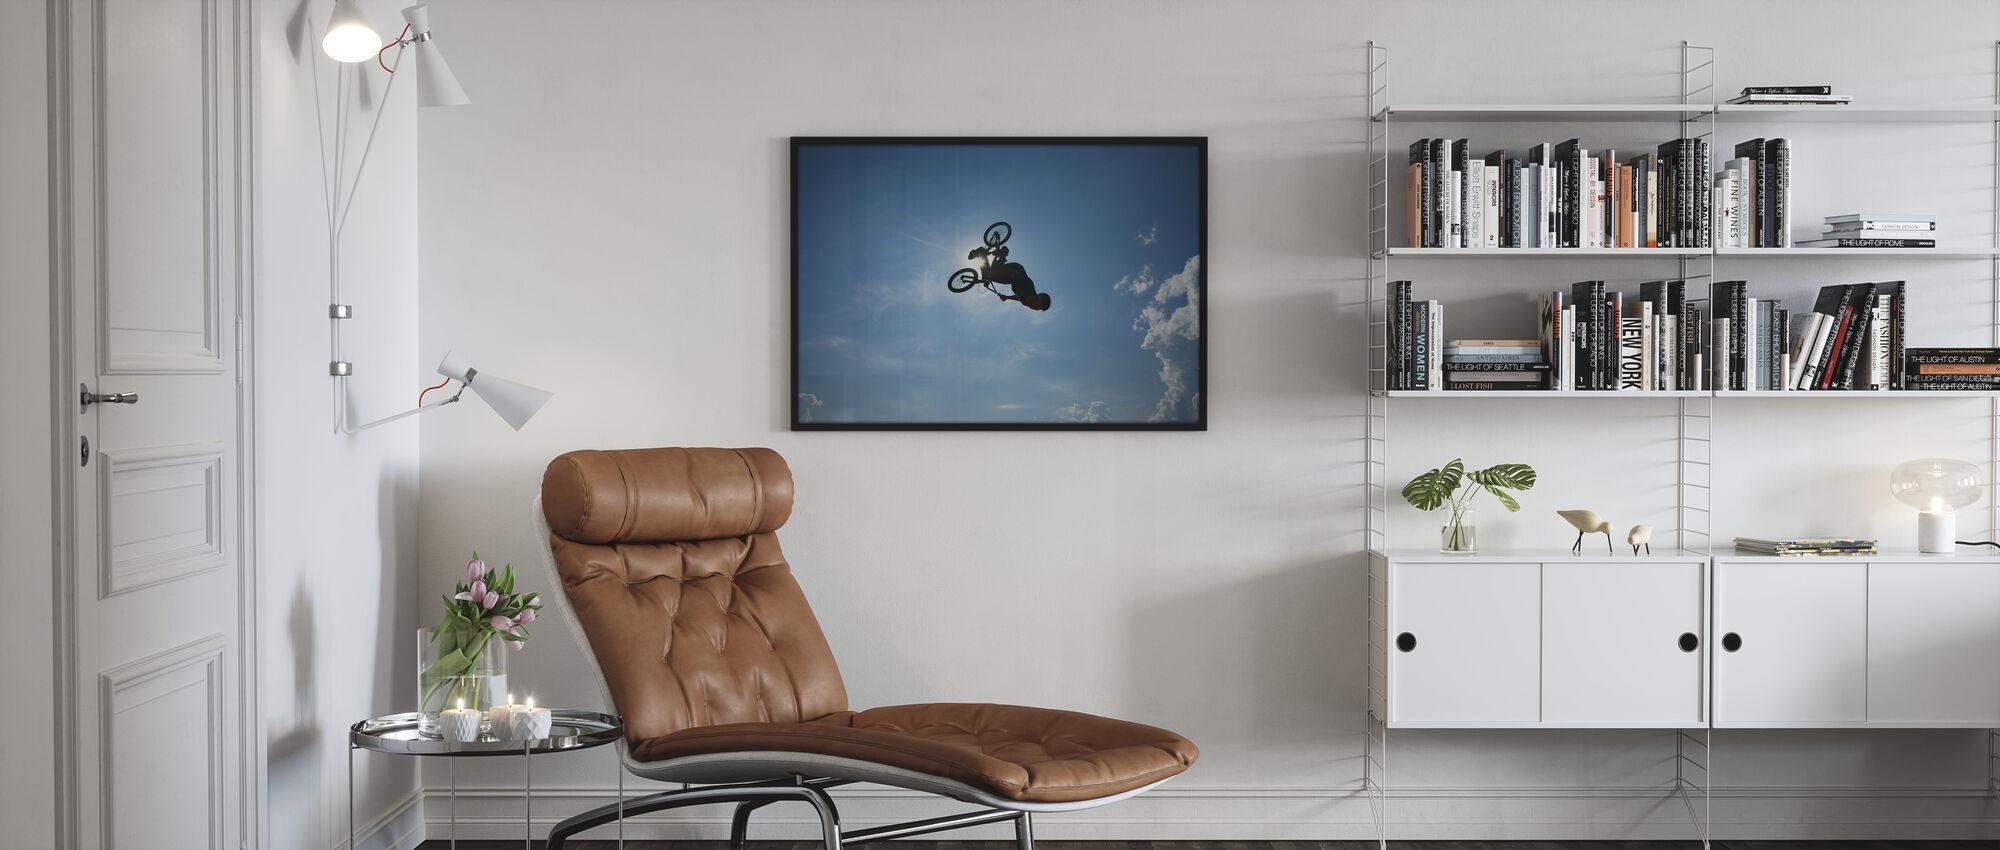 BMX Backflip - Poster - Wohnzimmer